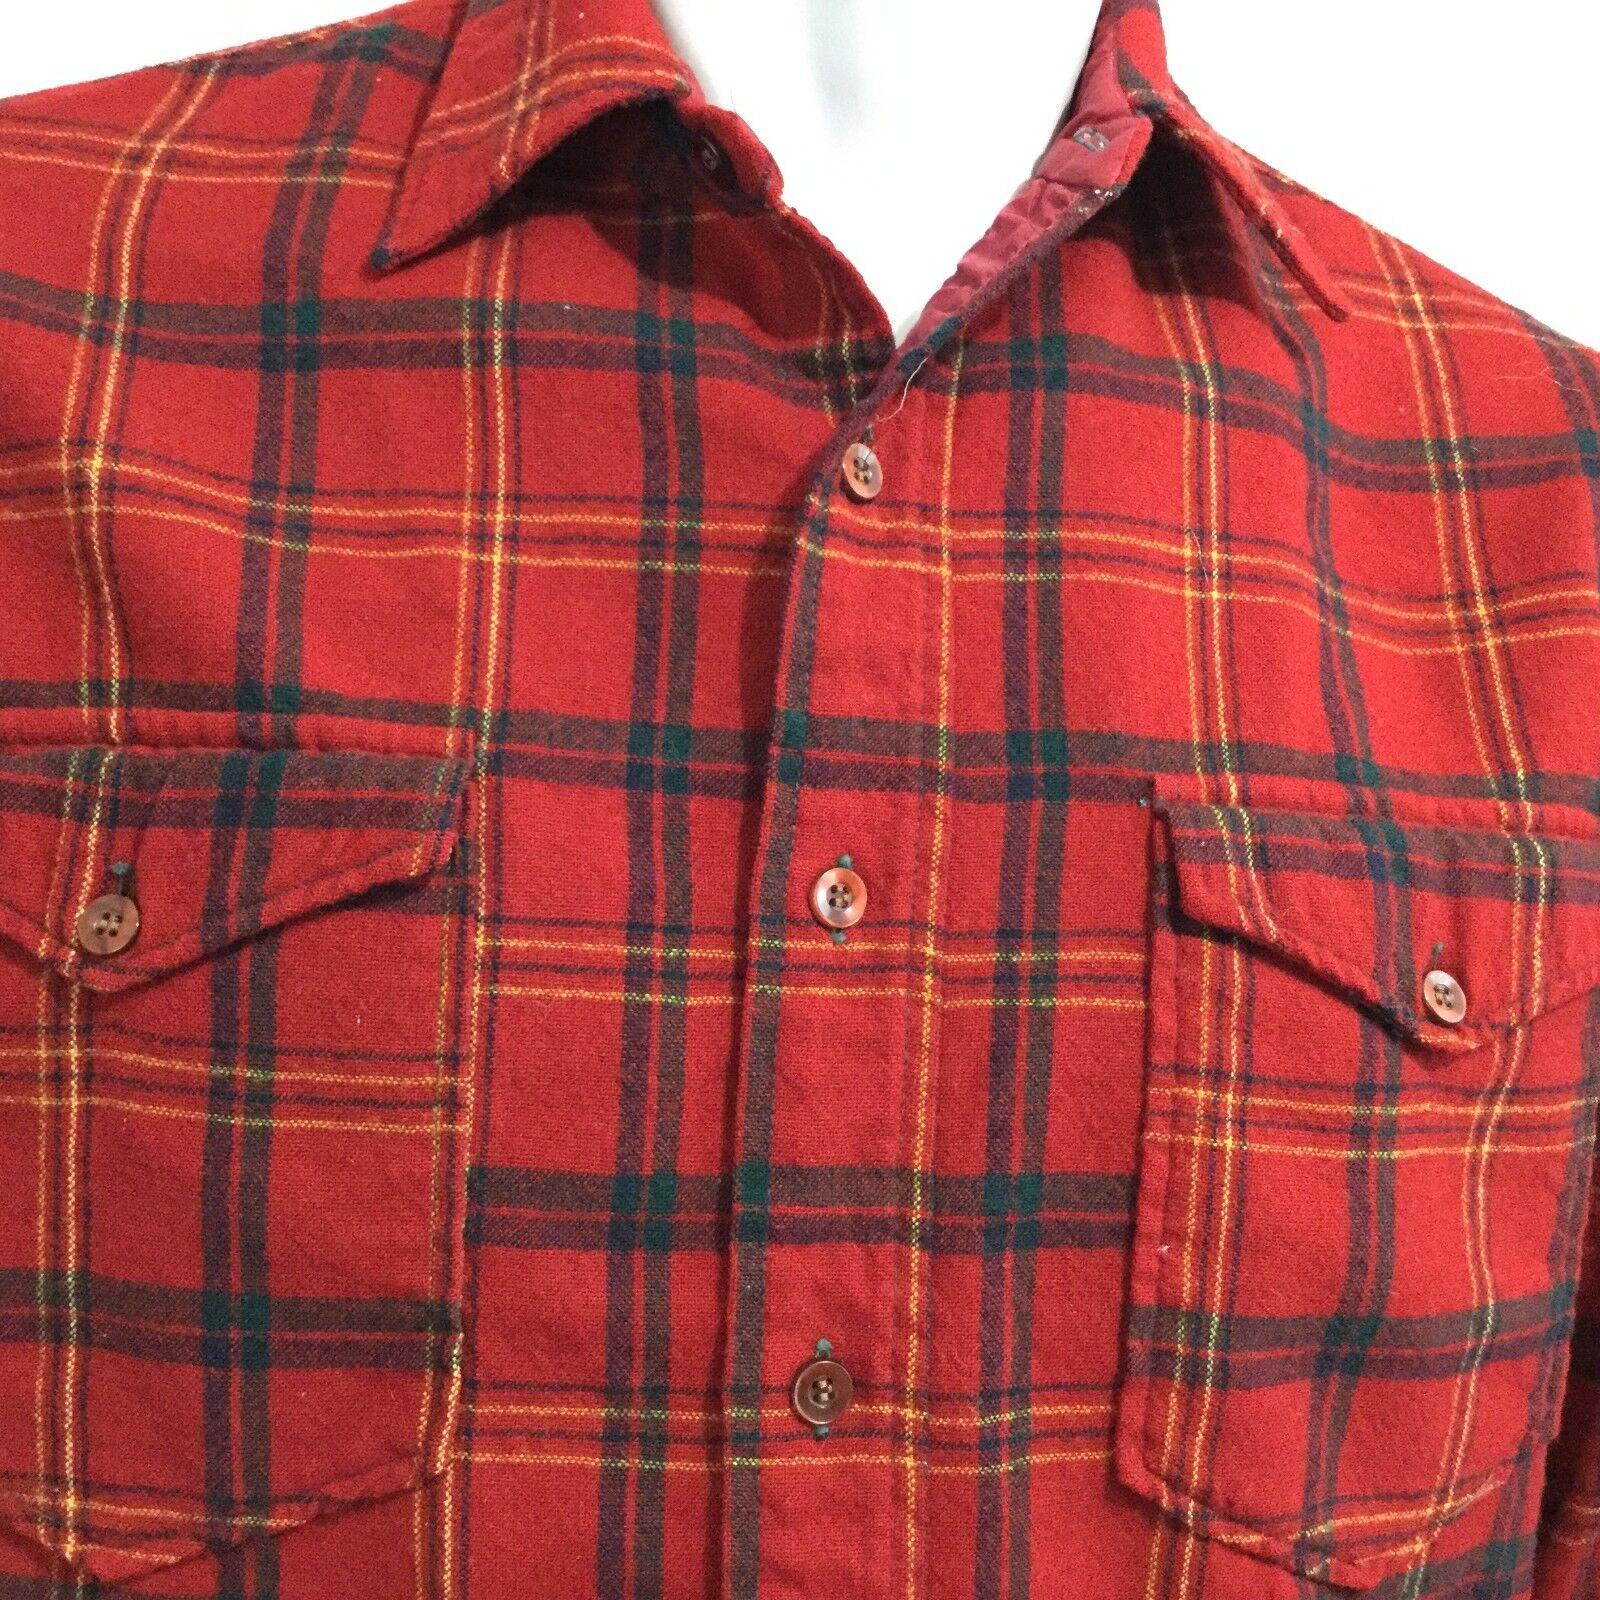 Vtg Pendleton Flannel Board Shirt Sz 15 1 2 Red Buffalo Plaid Tartan USA Wool